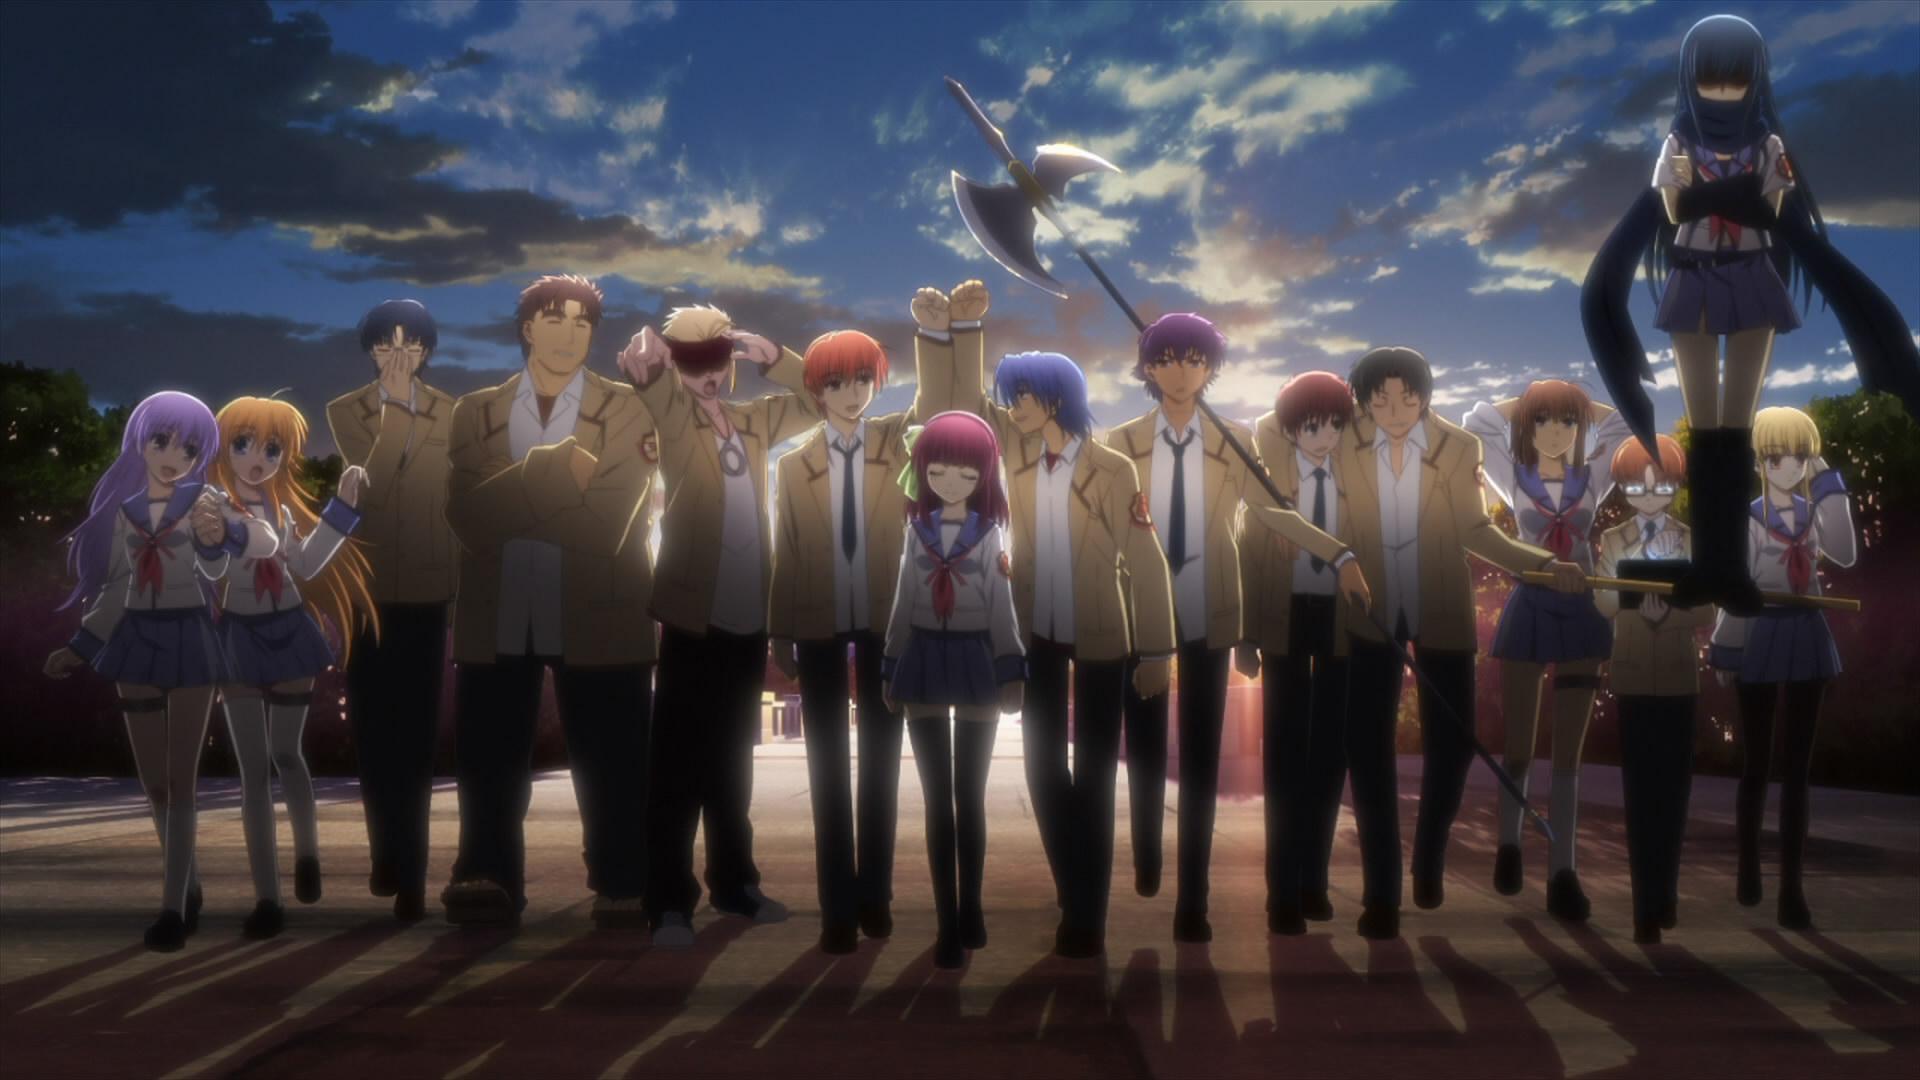 206344 - Un género, un anime - Hablemos de Anime y Manga